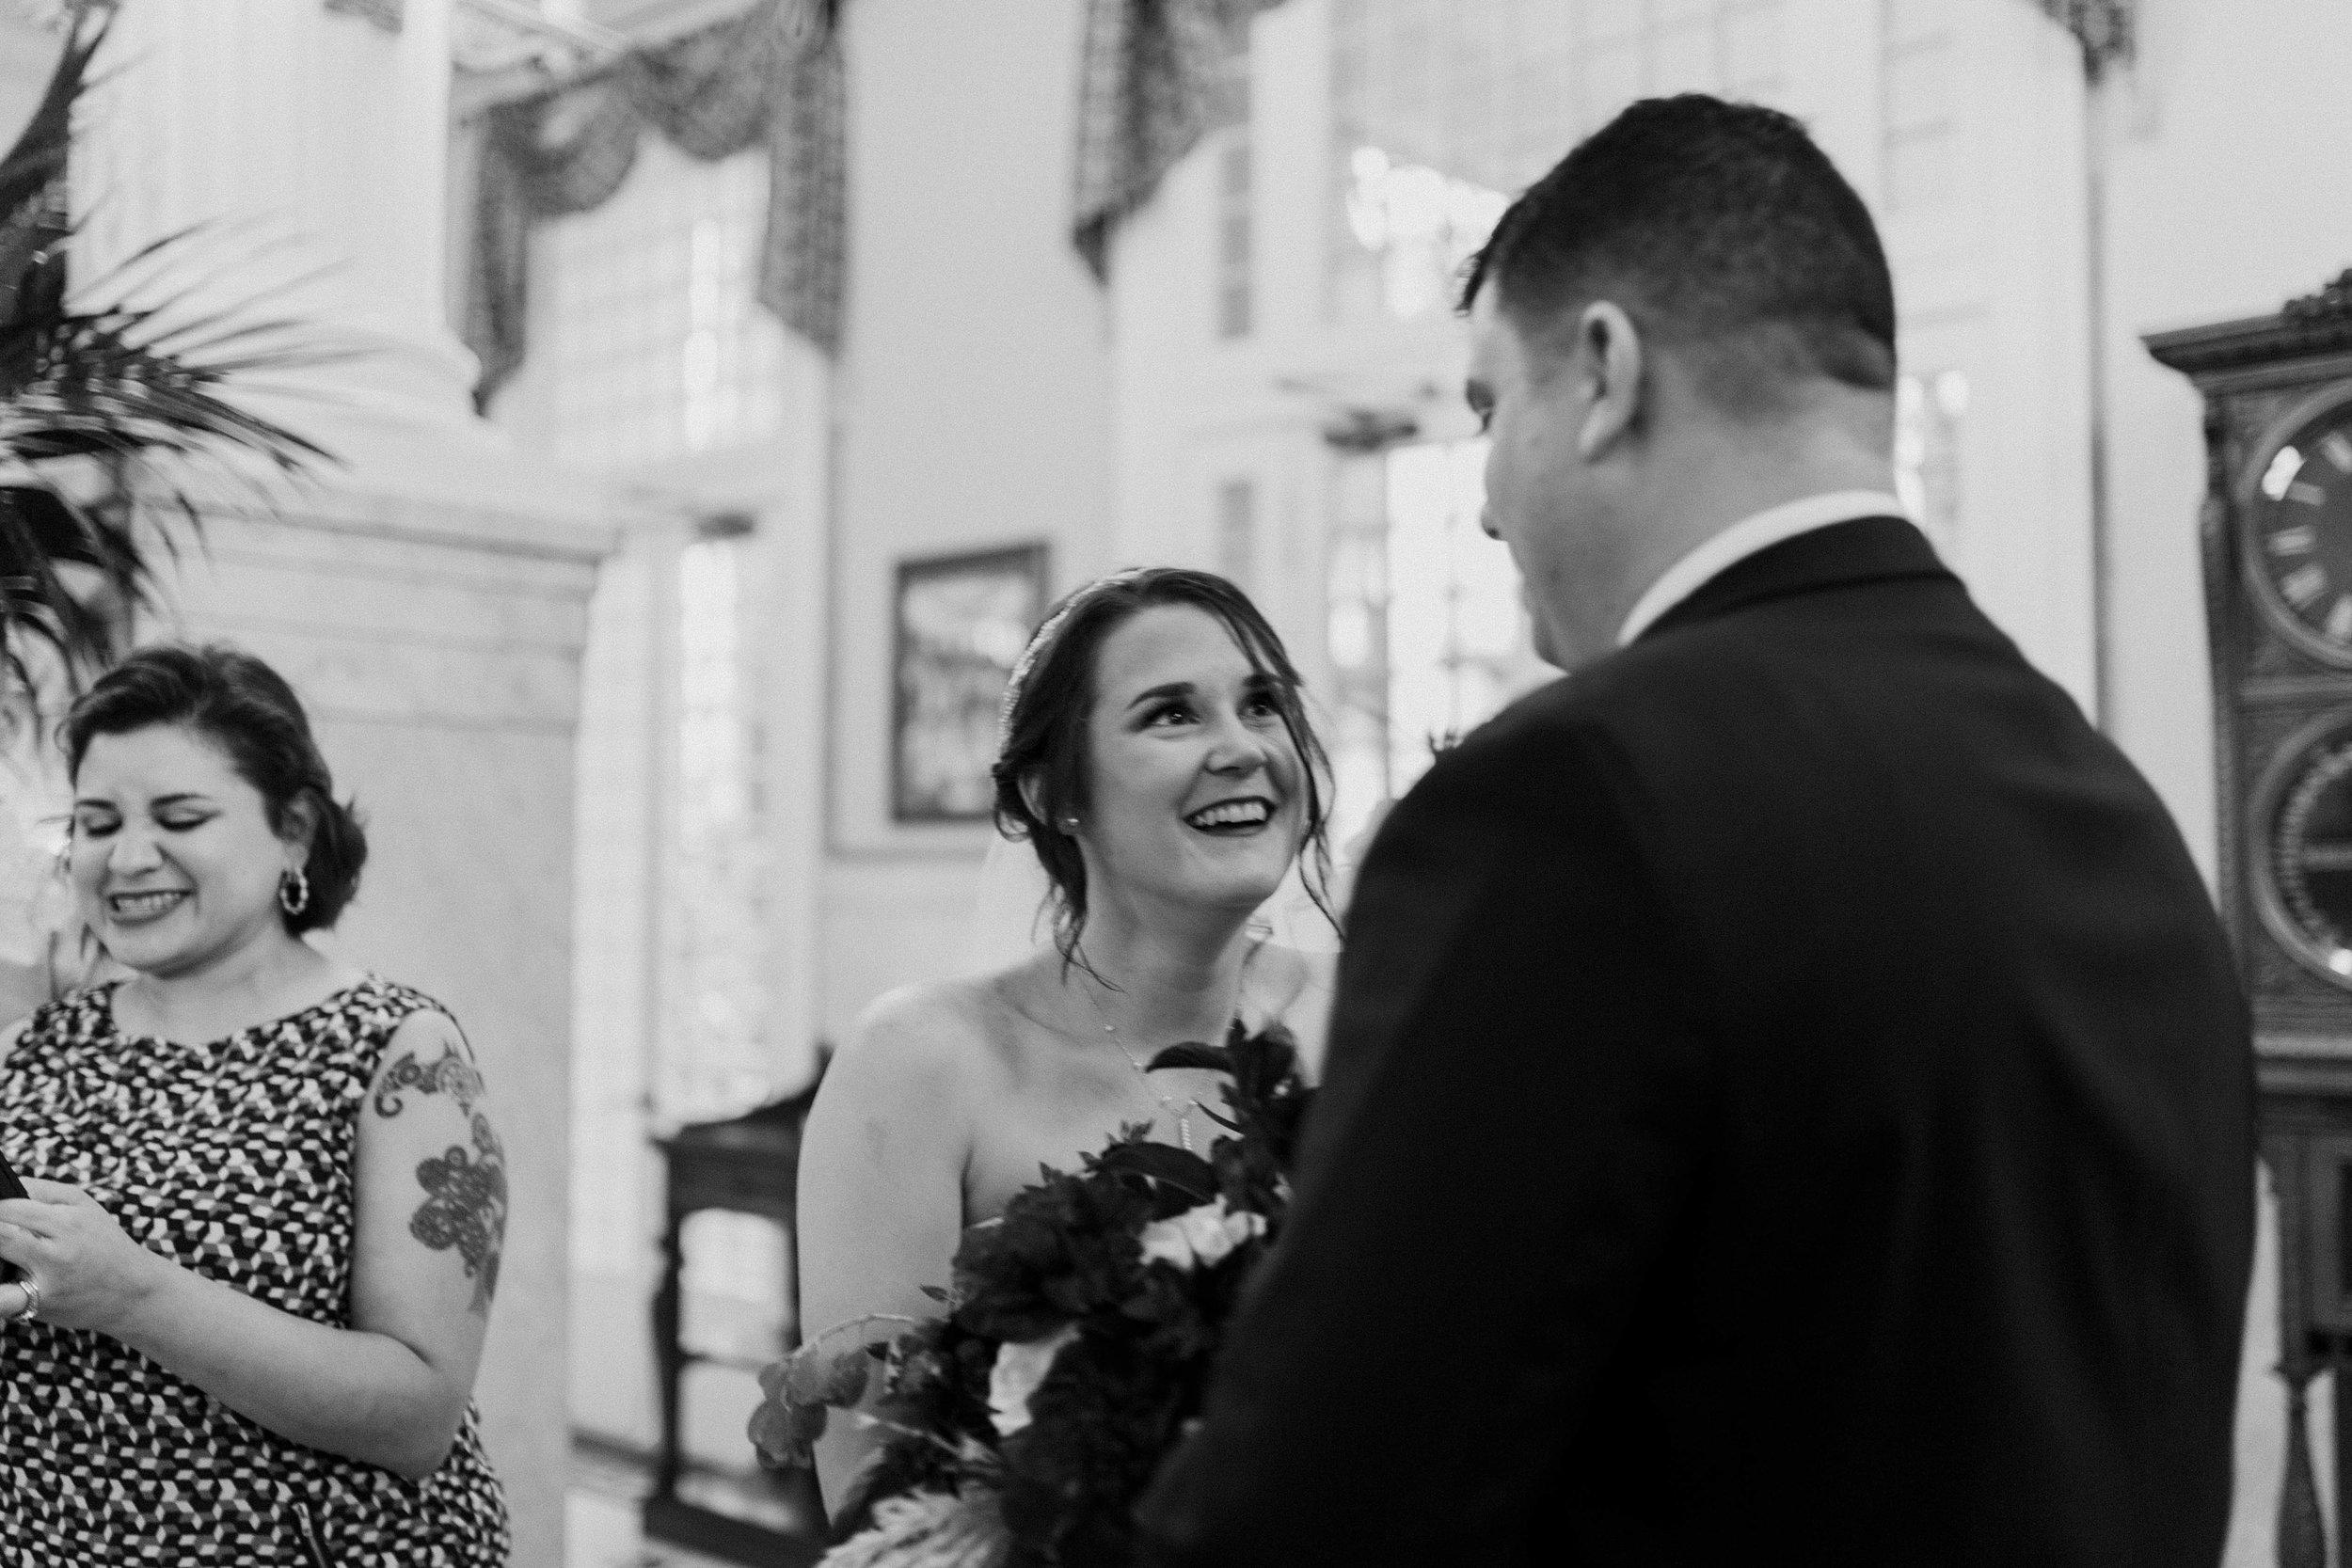 Savannah_Wedding_2018-51.jpg